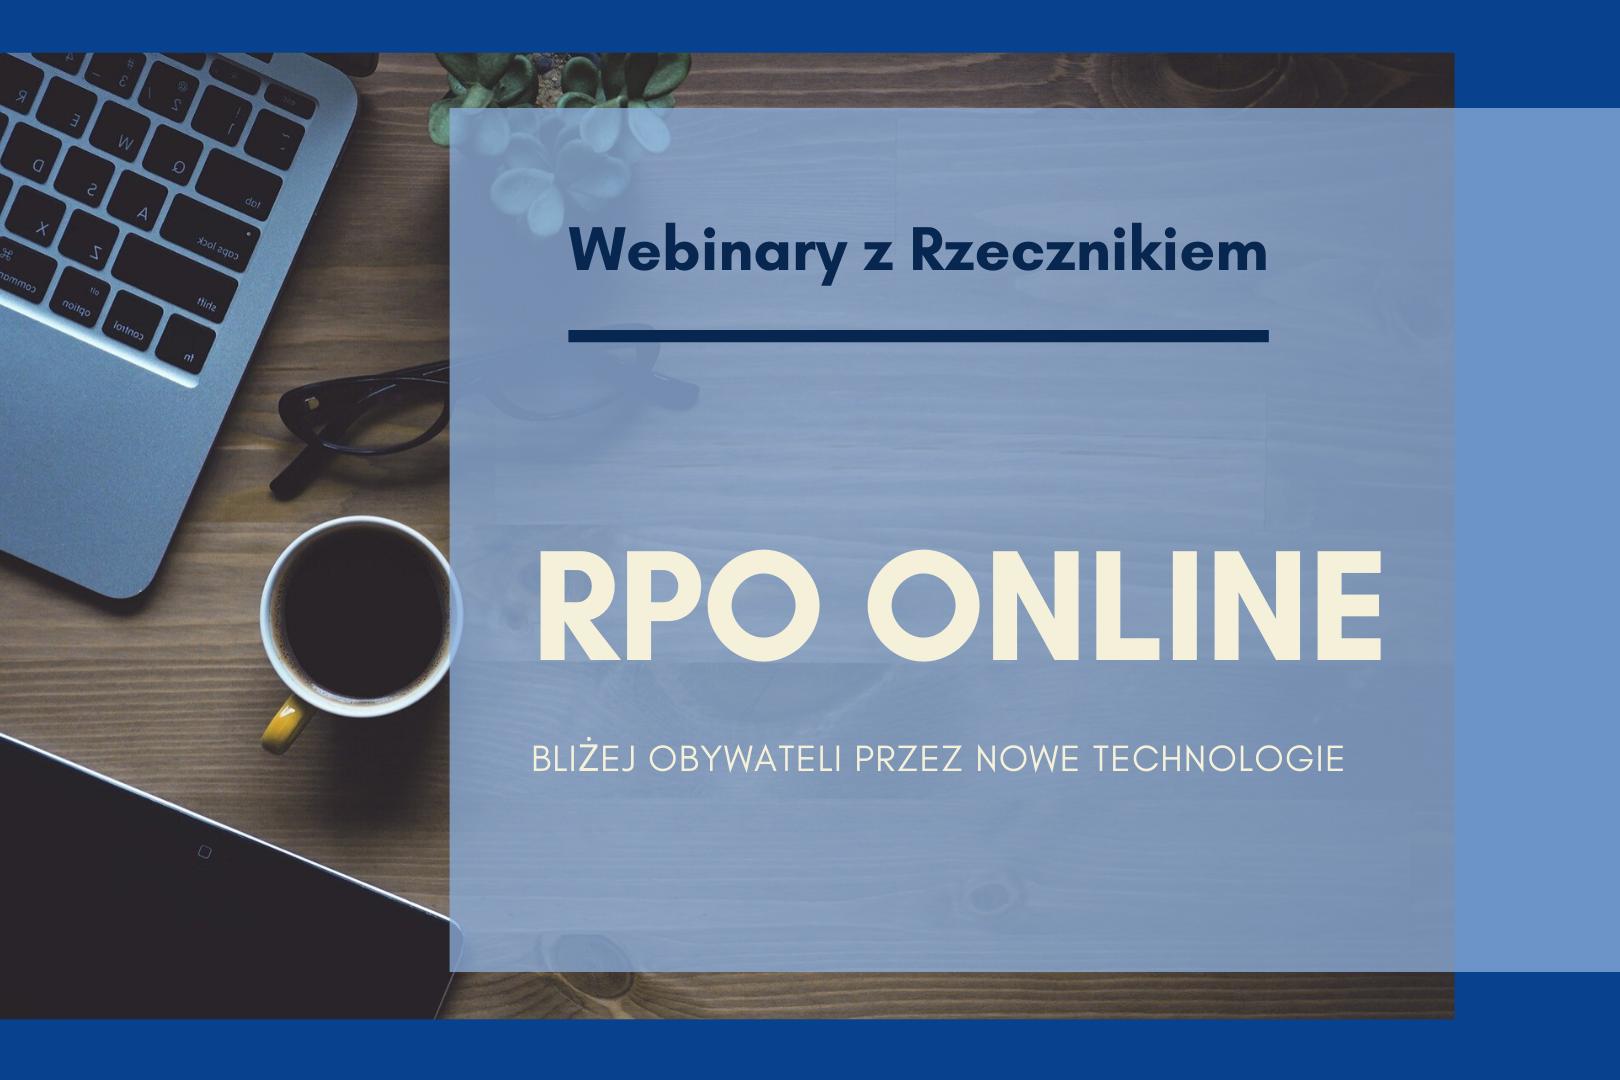 plansza z napisem RPO online